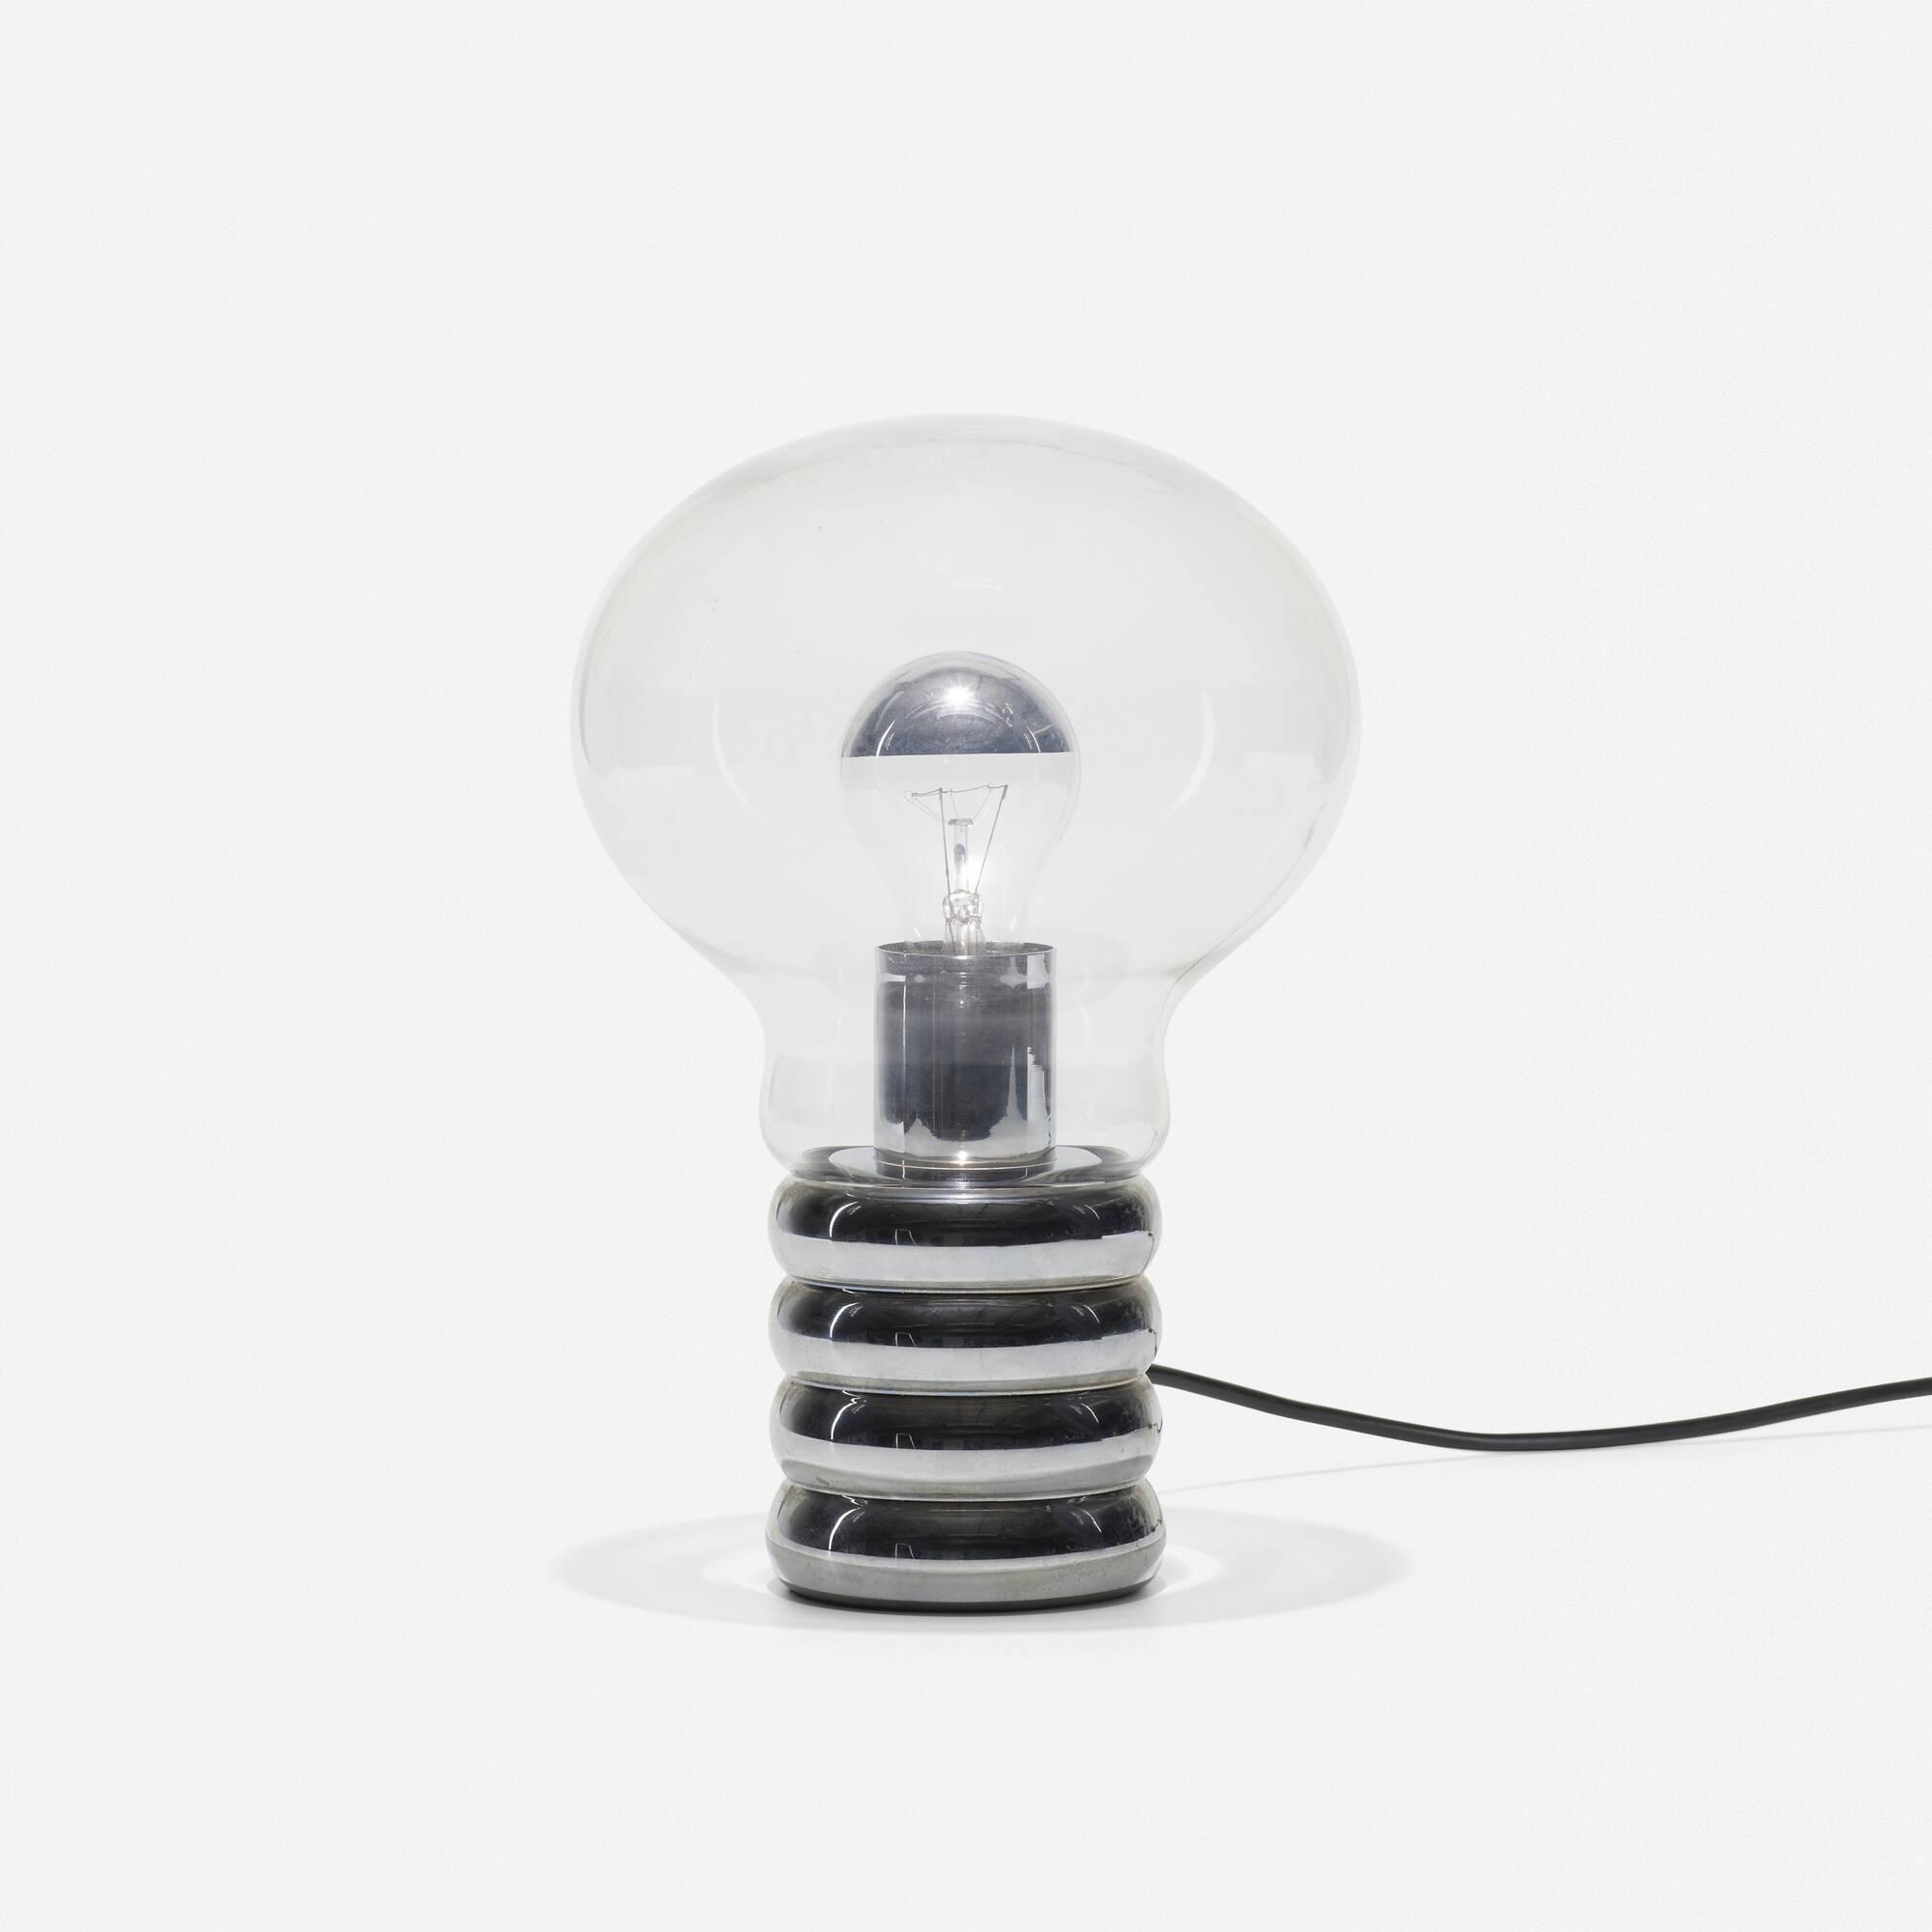 265: Ingo Maurer / Bulb table lamp (1 of 2)